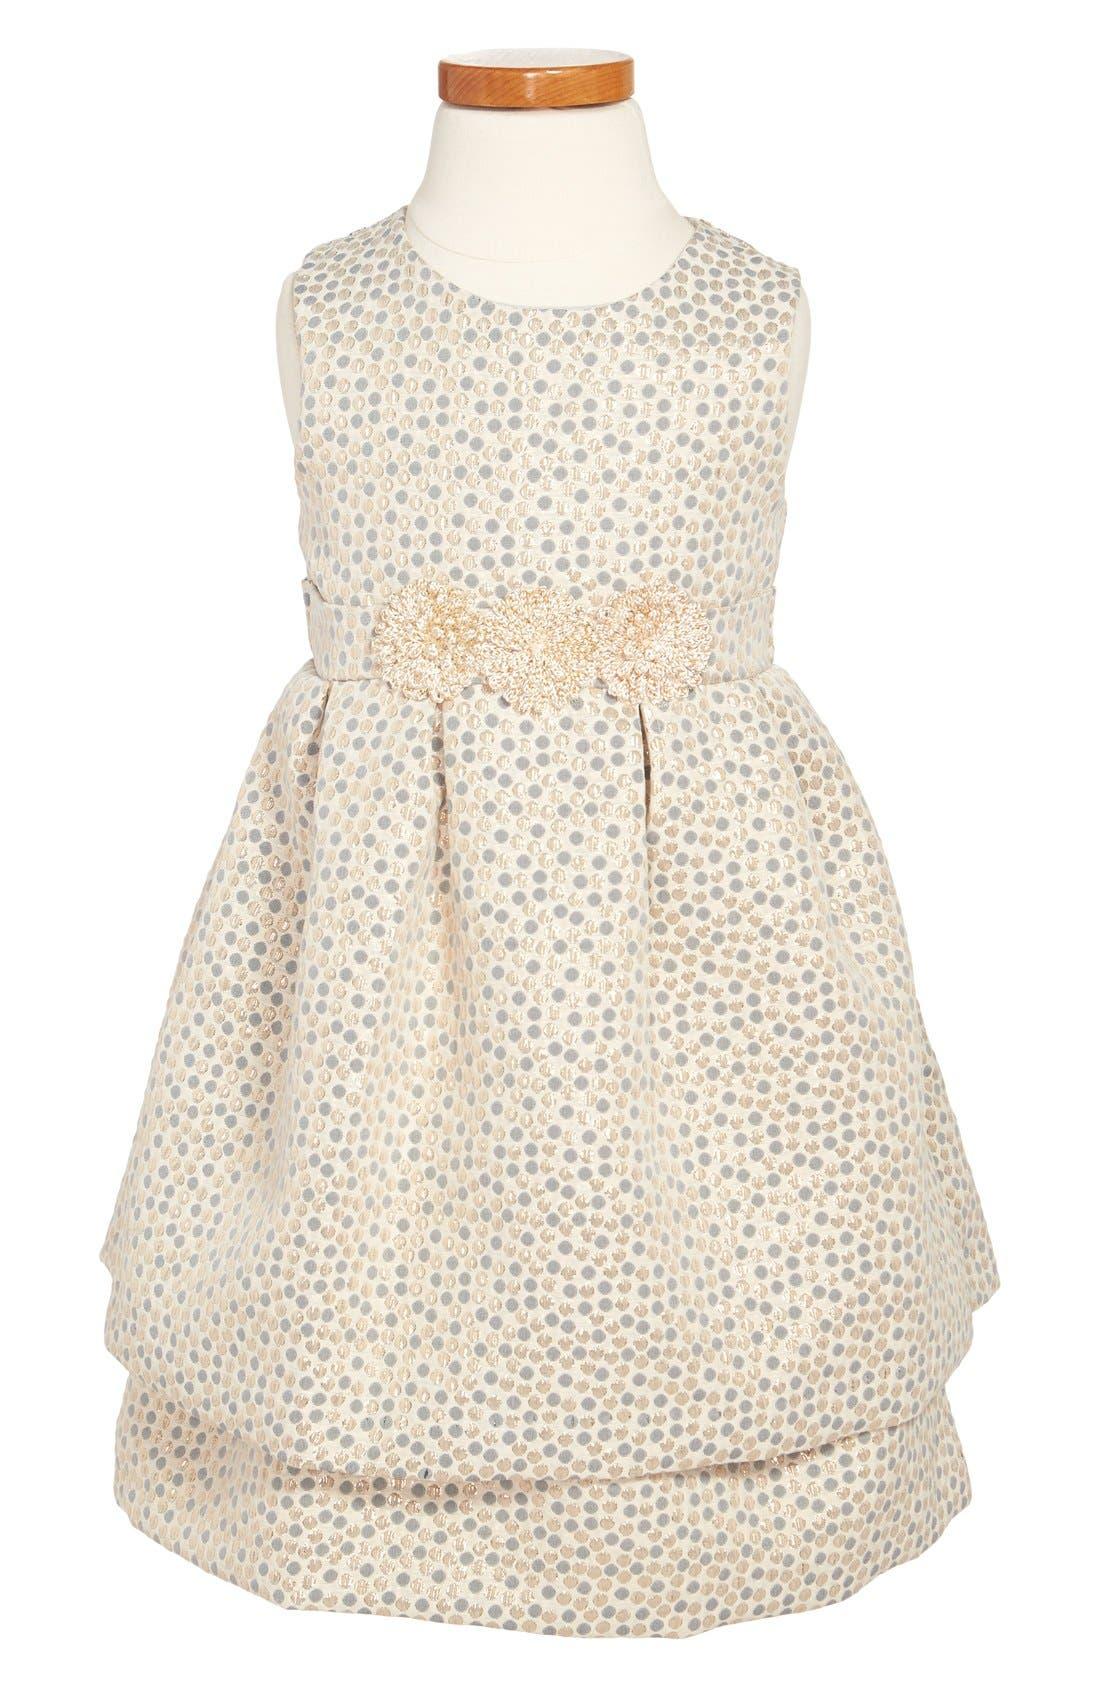 Alternate Image 1 Selected - Pippa & Julie Sleeveless Brocade Dress (Toddler Girls, Little Girls & Big Girls)